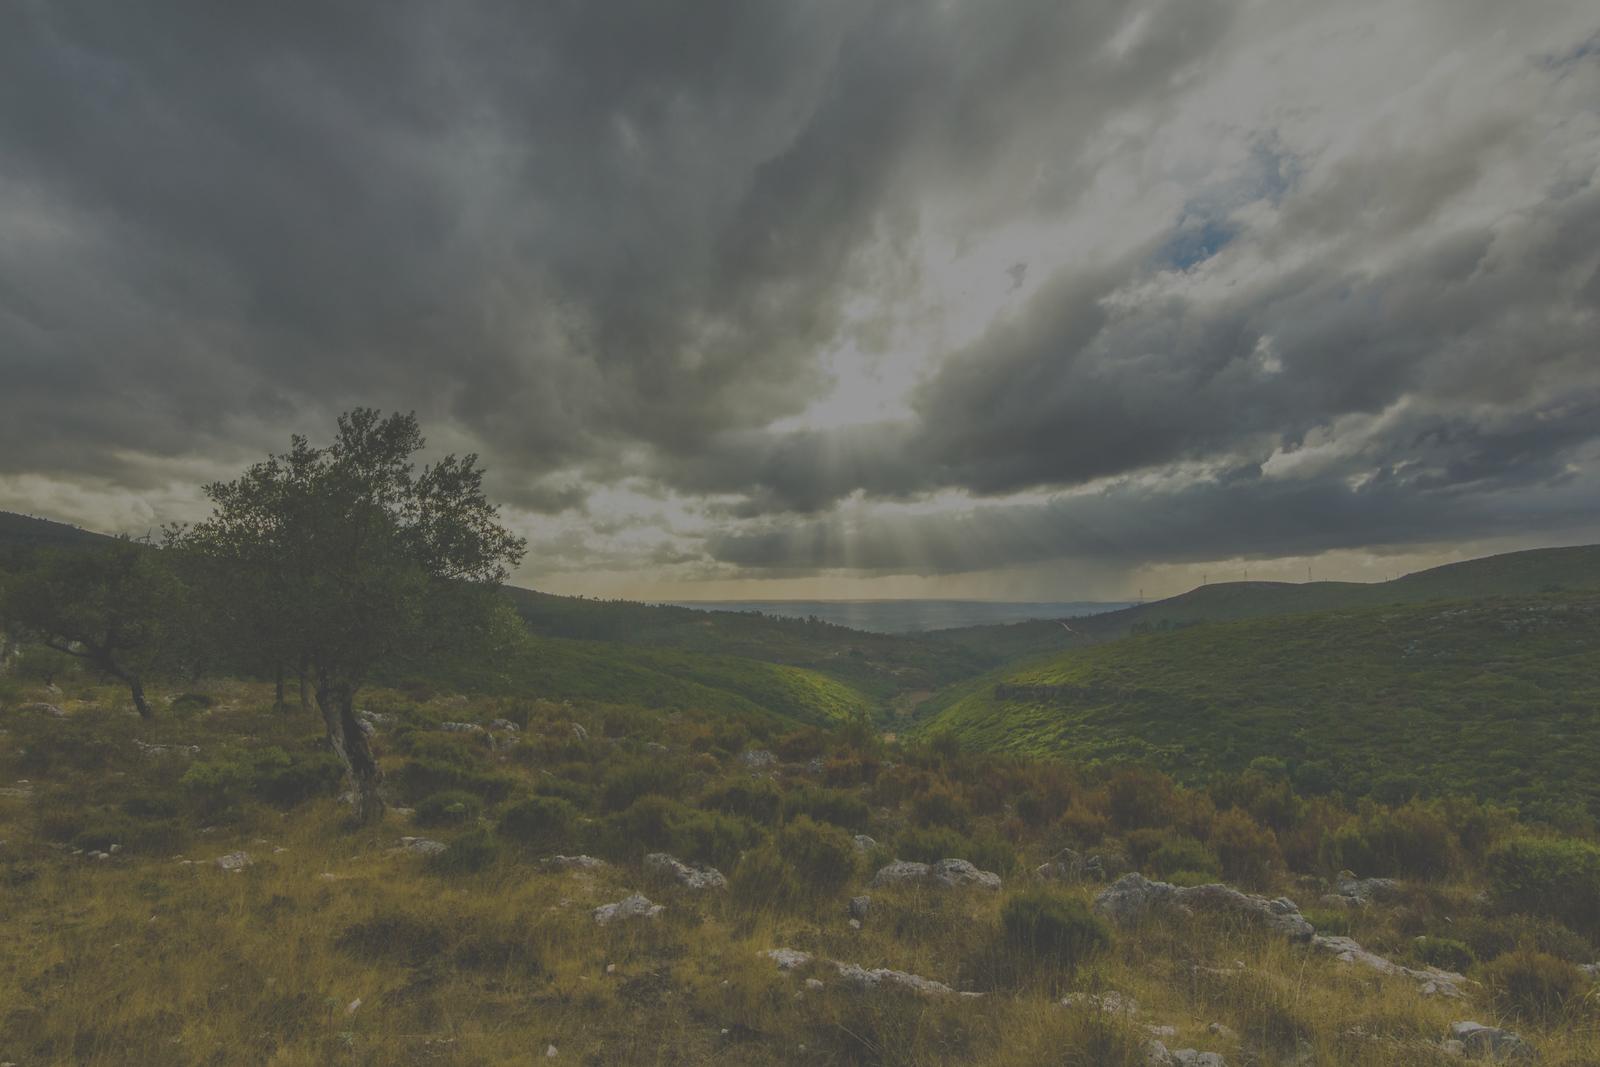 Peeking through the clouds